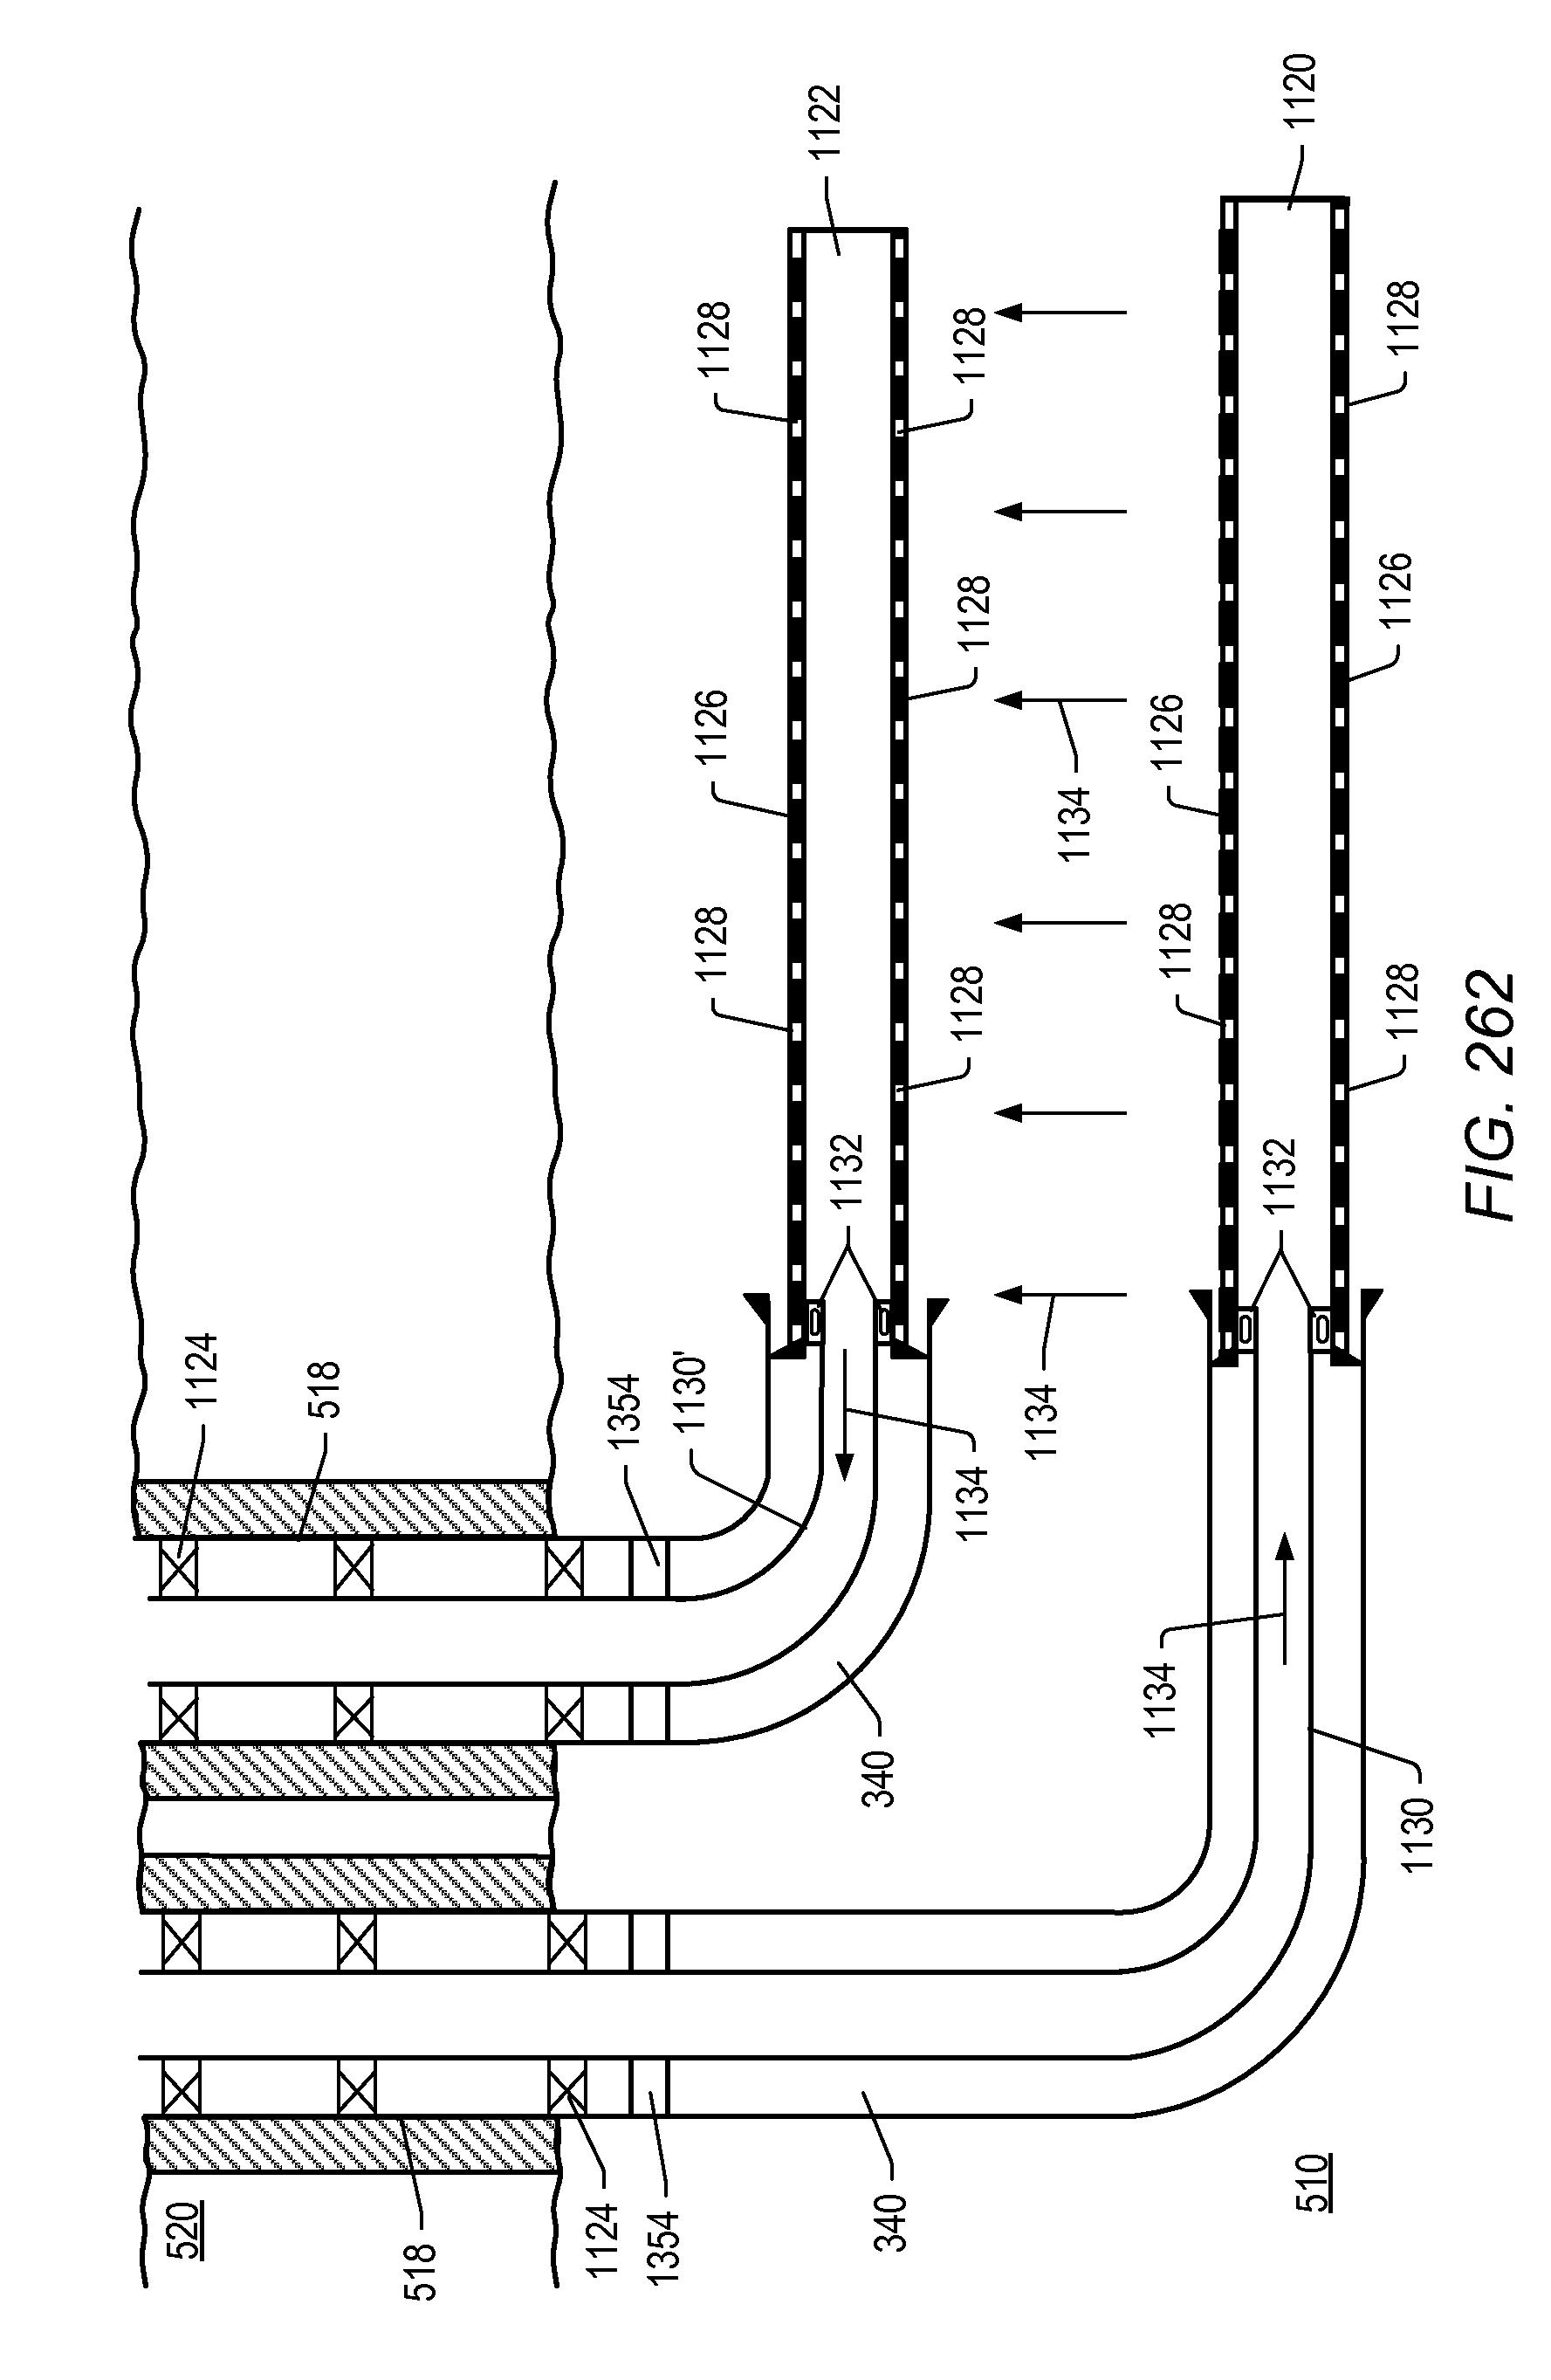 Patent Us 9528322 B2 Inertia Fuel Shut Off Switch On 2000 S10 Pump Wiring Diagram Images